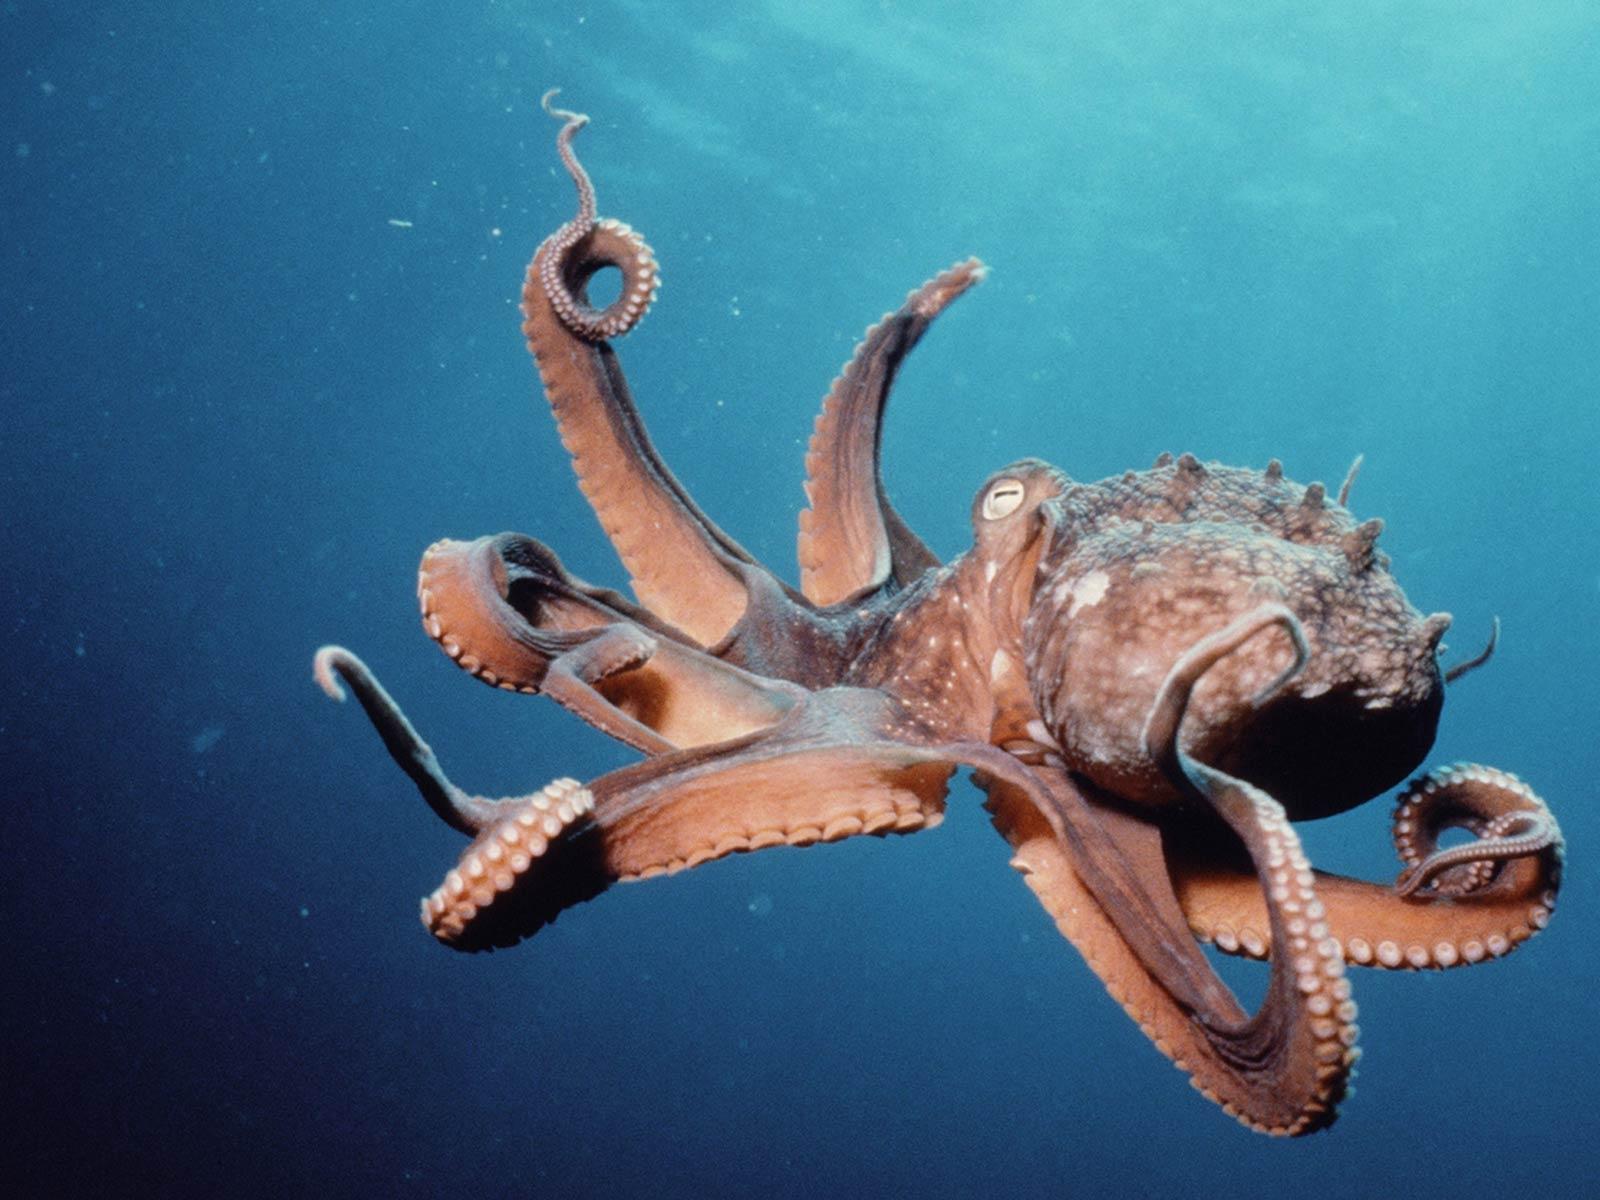 free Octopus wallpaper wallpapers download